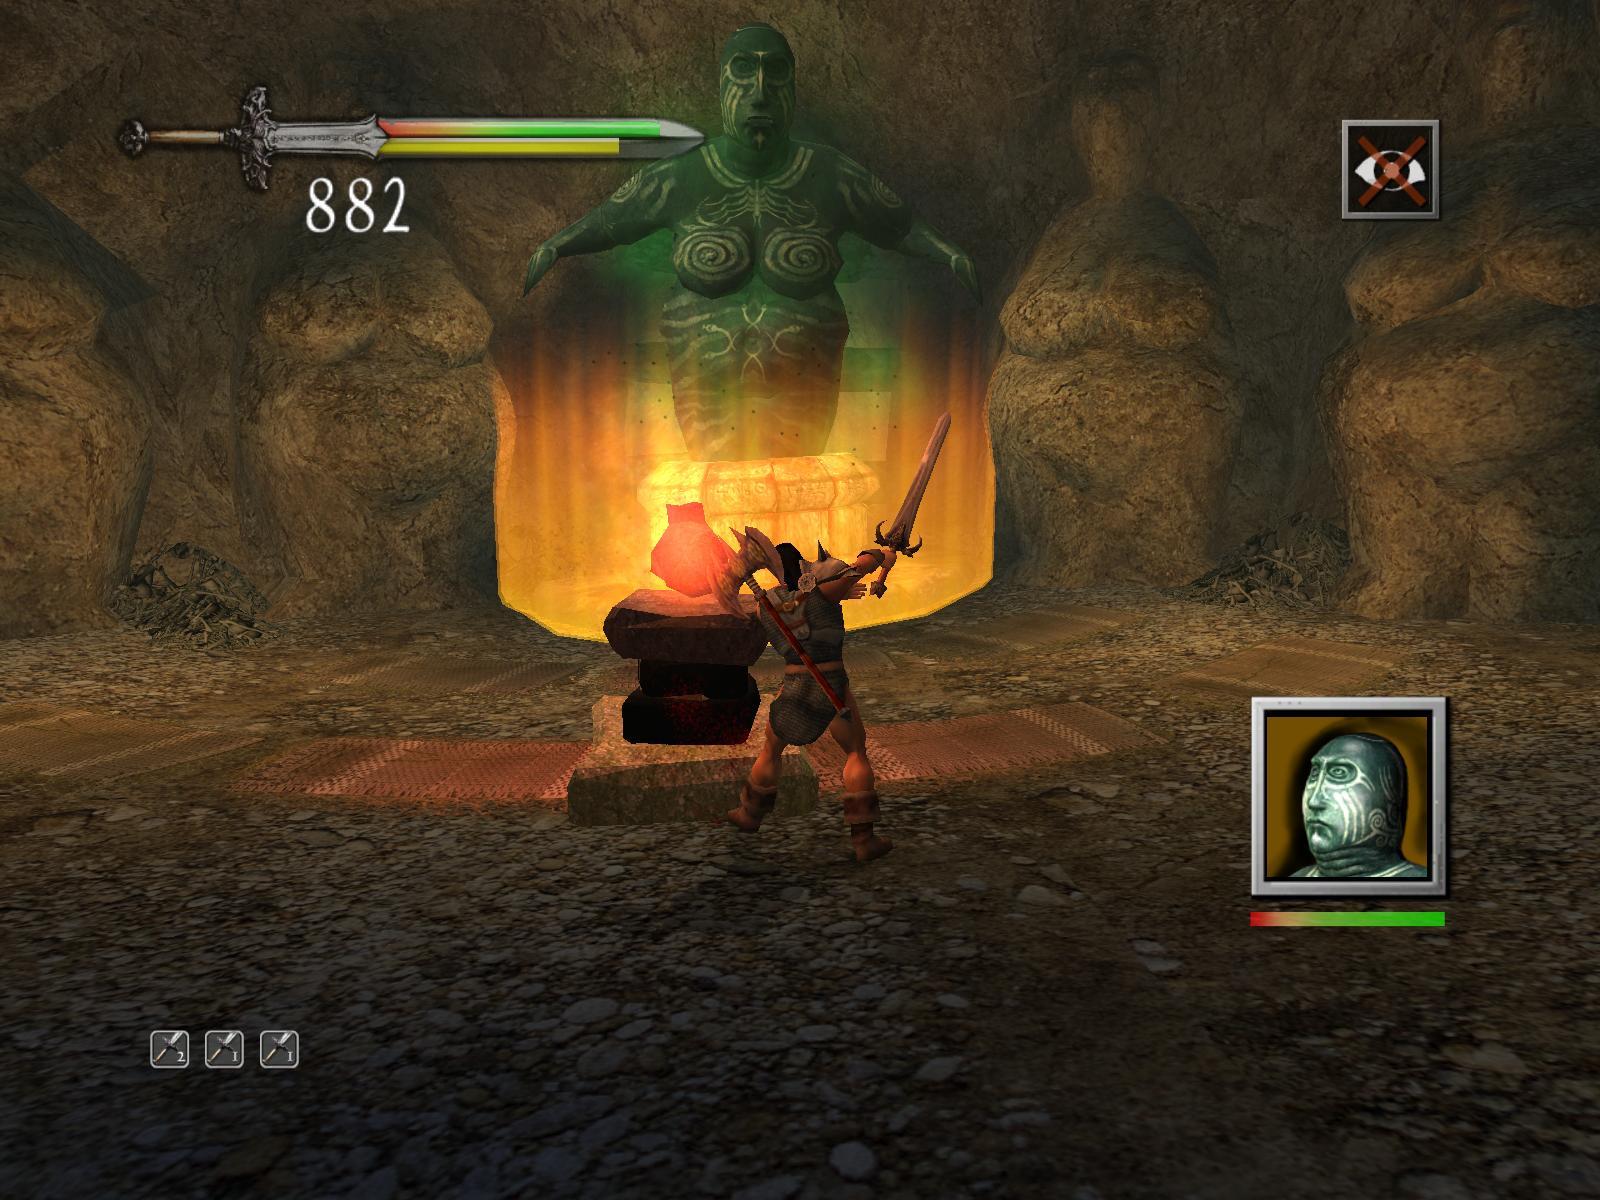 Conan ( Eigene Bilder PC ) - Screenshot-Galerie | GamersGlobal